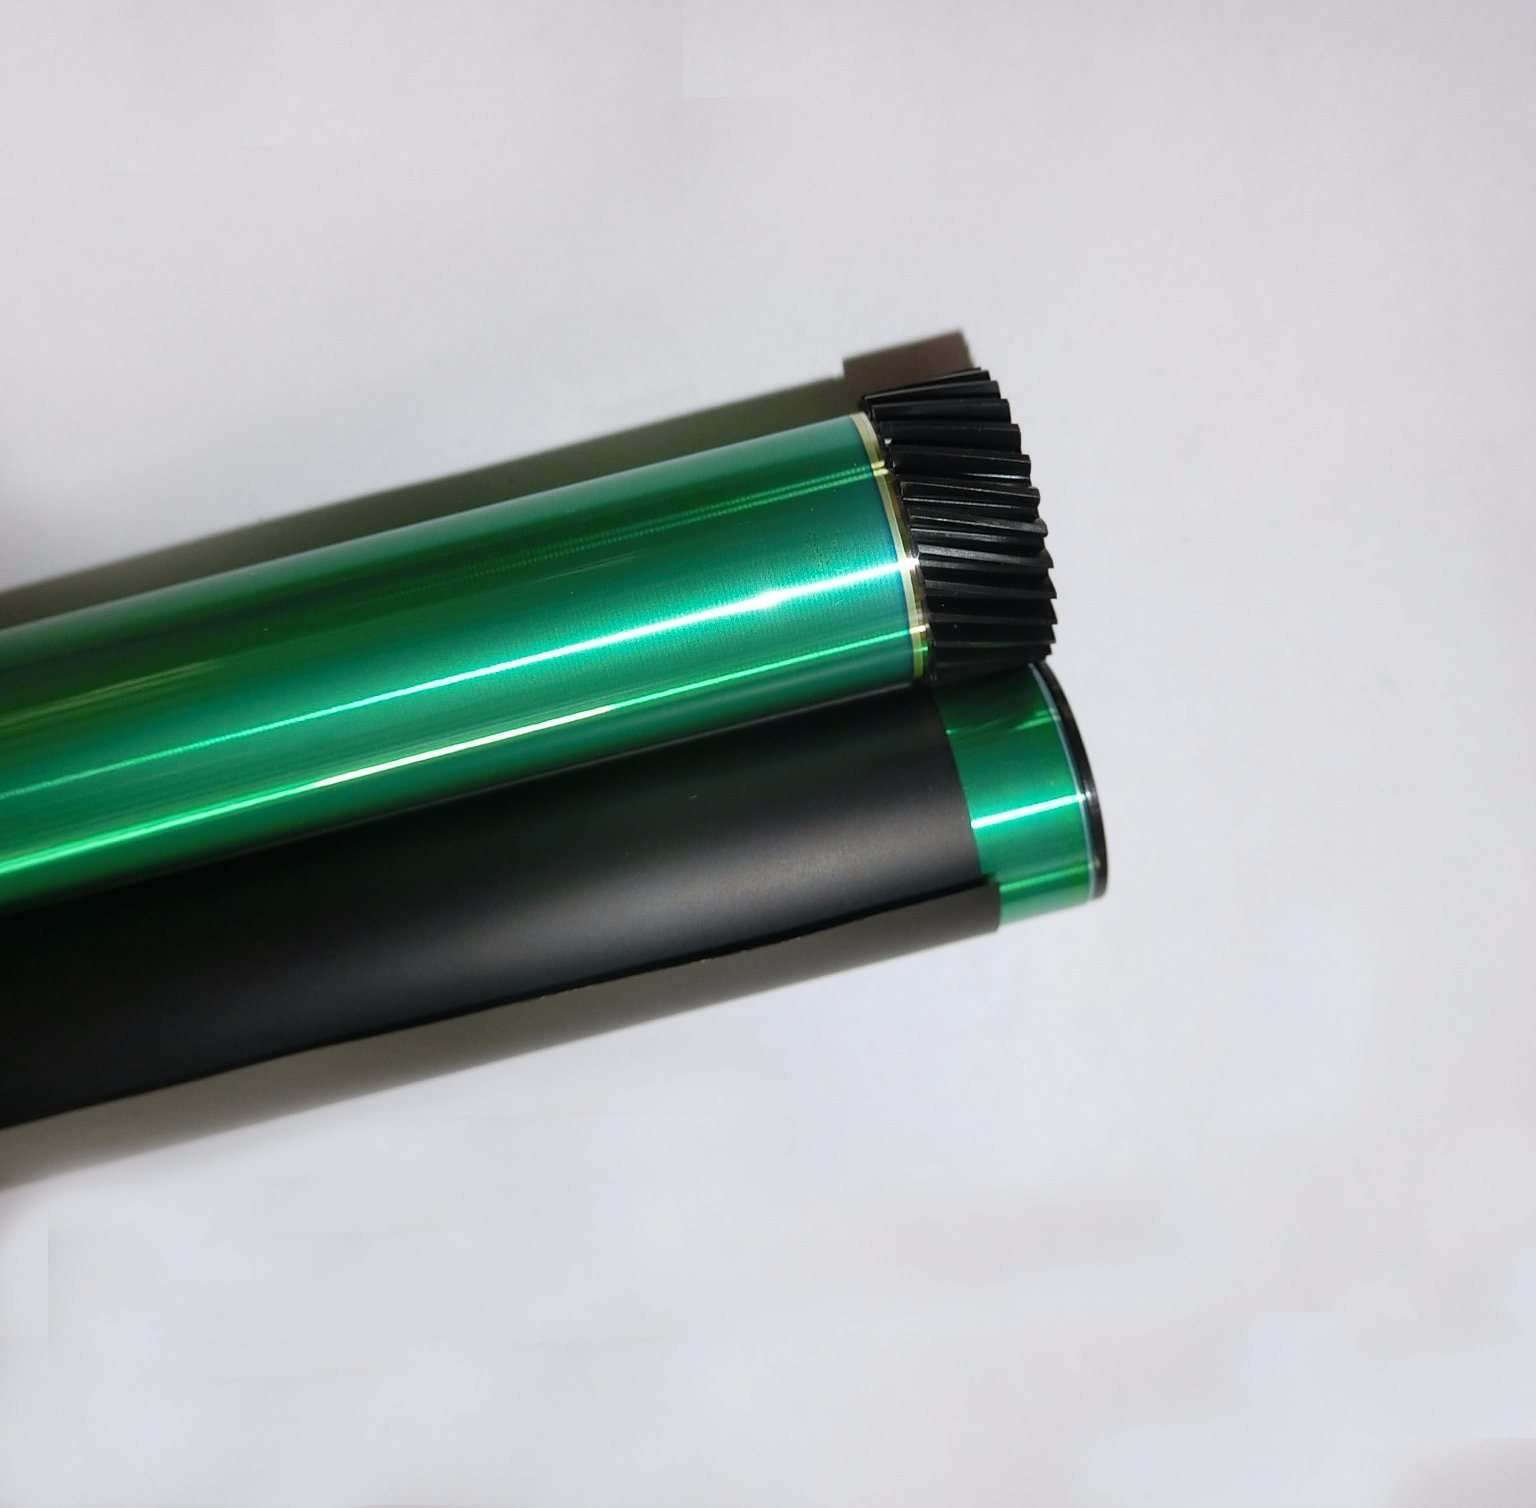 Compatible OPC Drum 2161 for Samsung Toner Cartridge Laser Printer